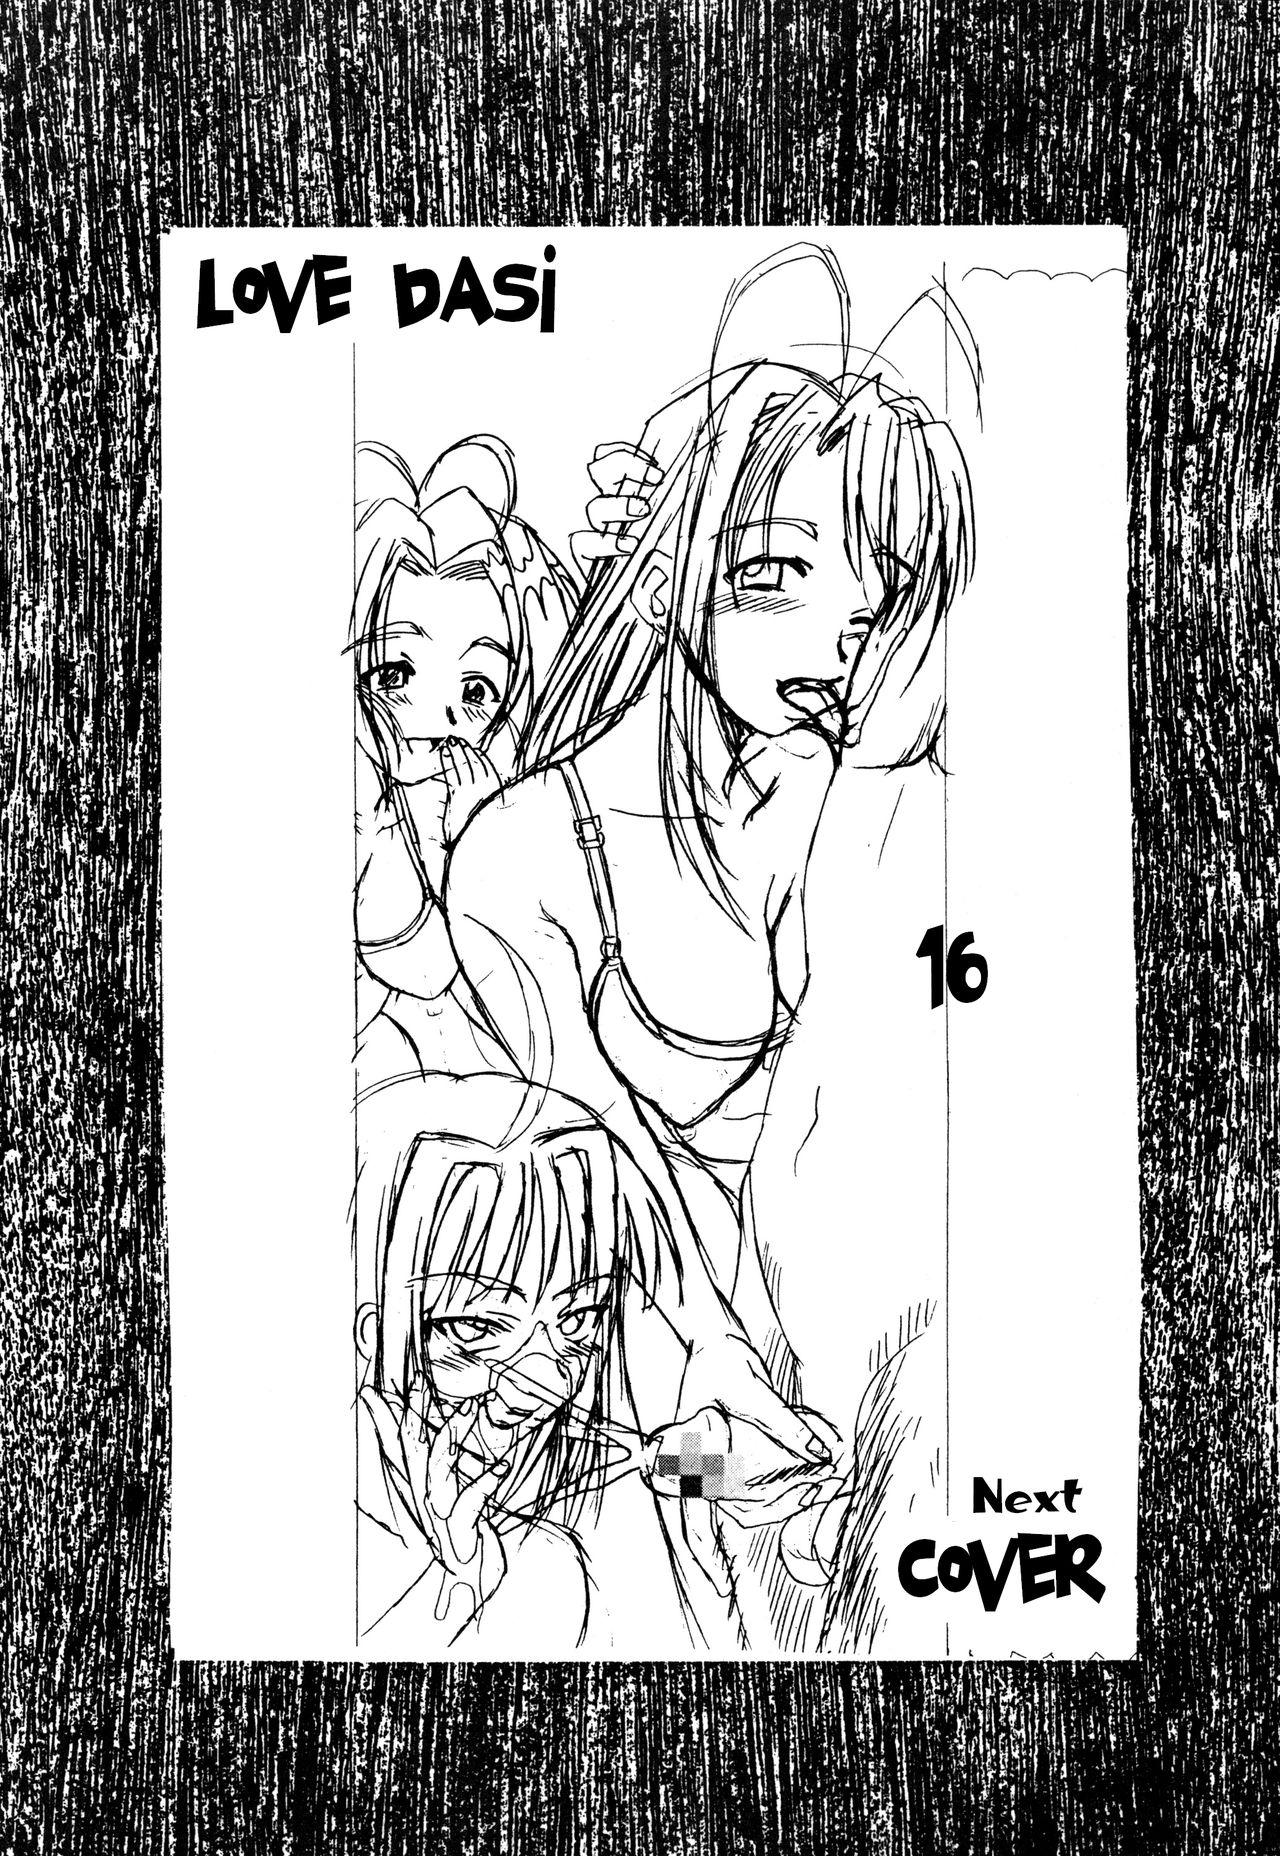 Love Dasi 15 3